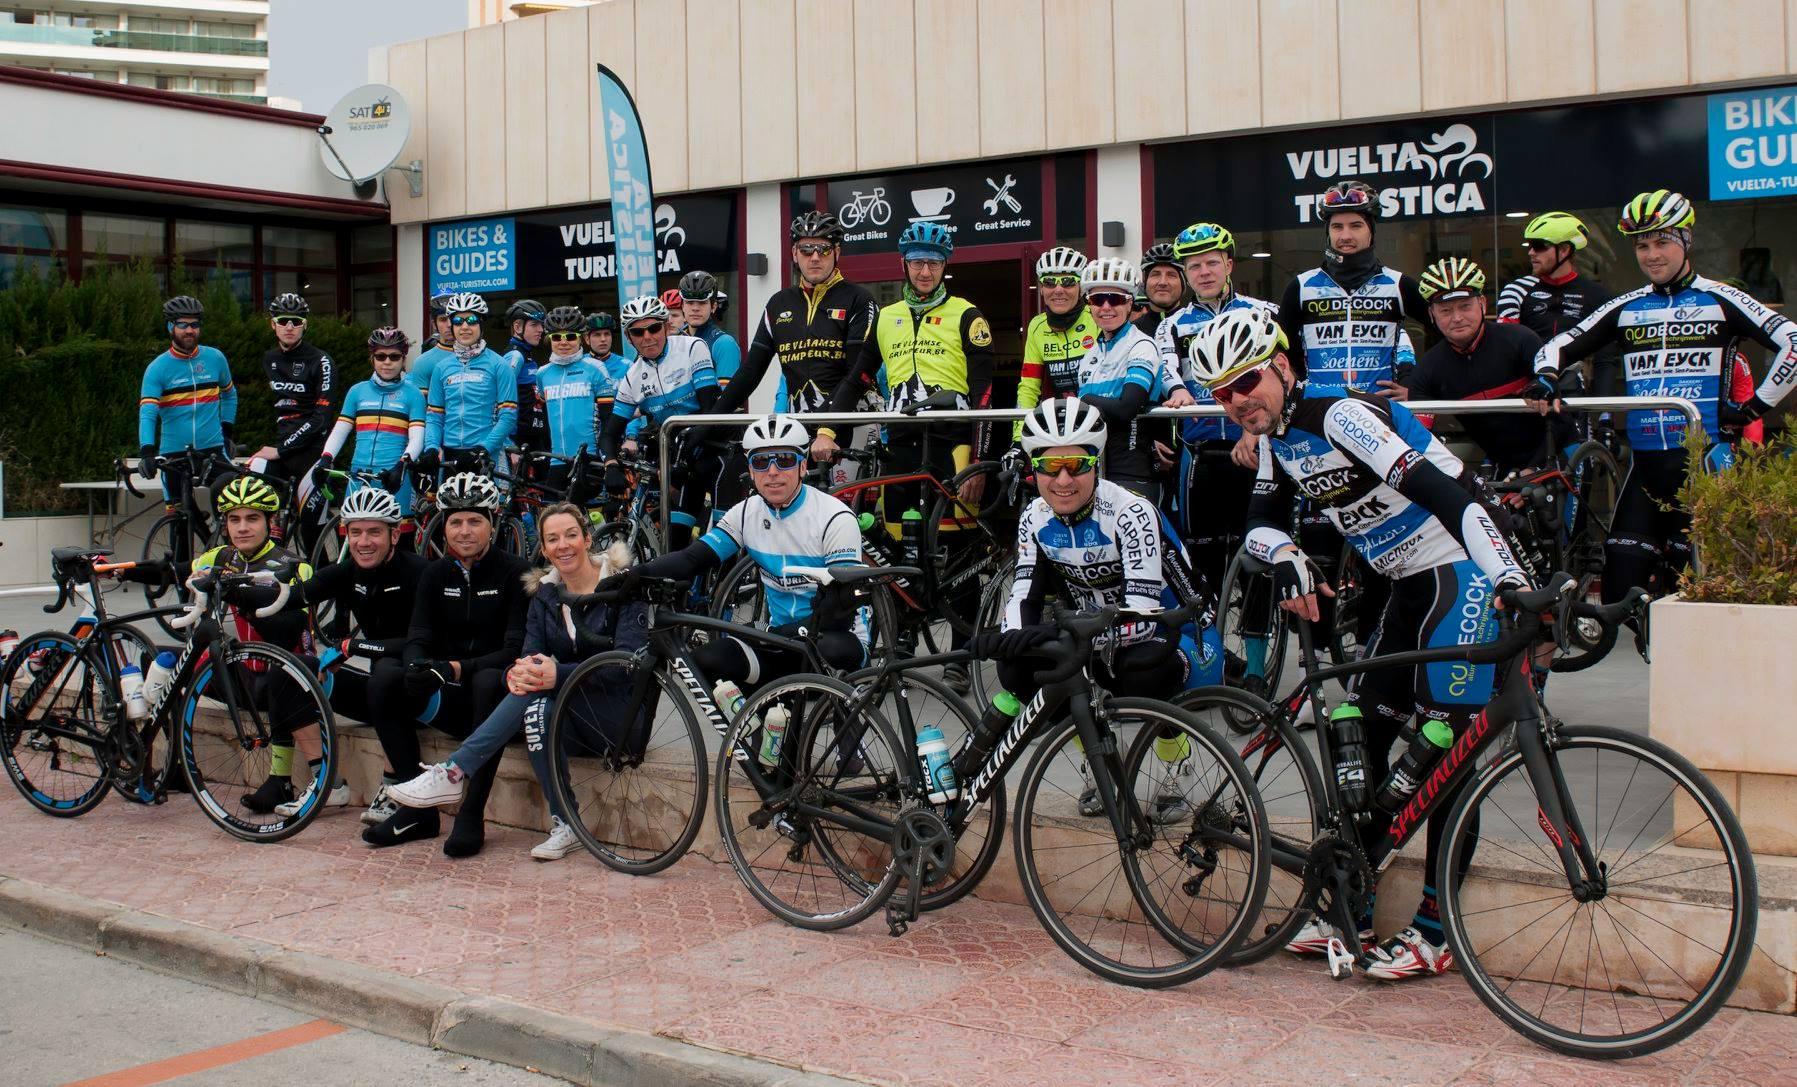 Vuelta Turistica 1